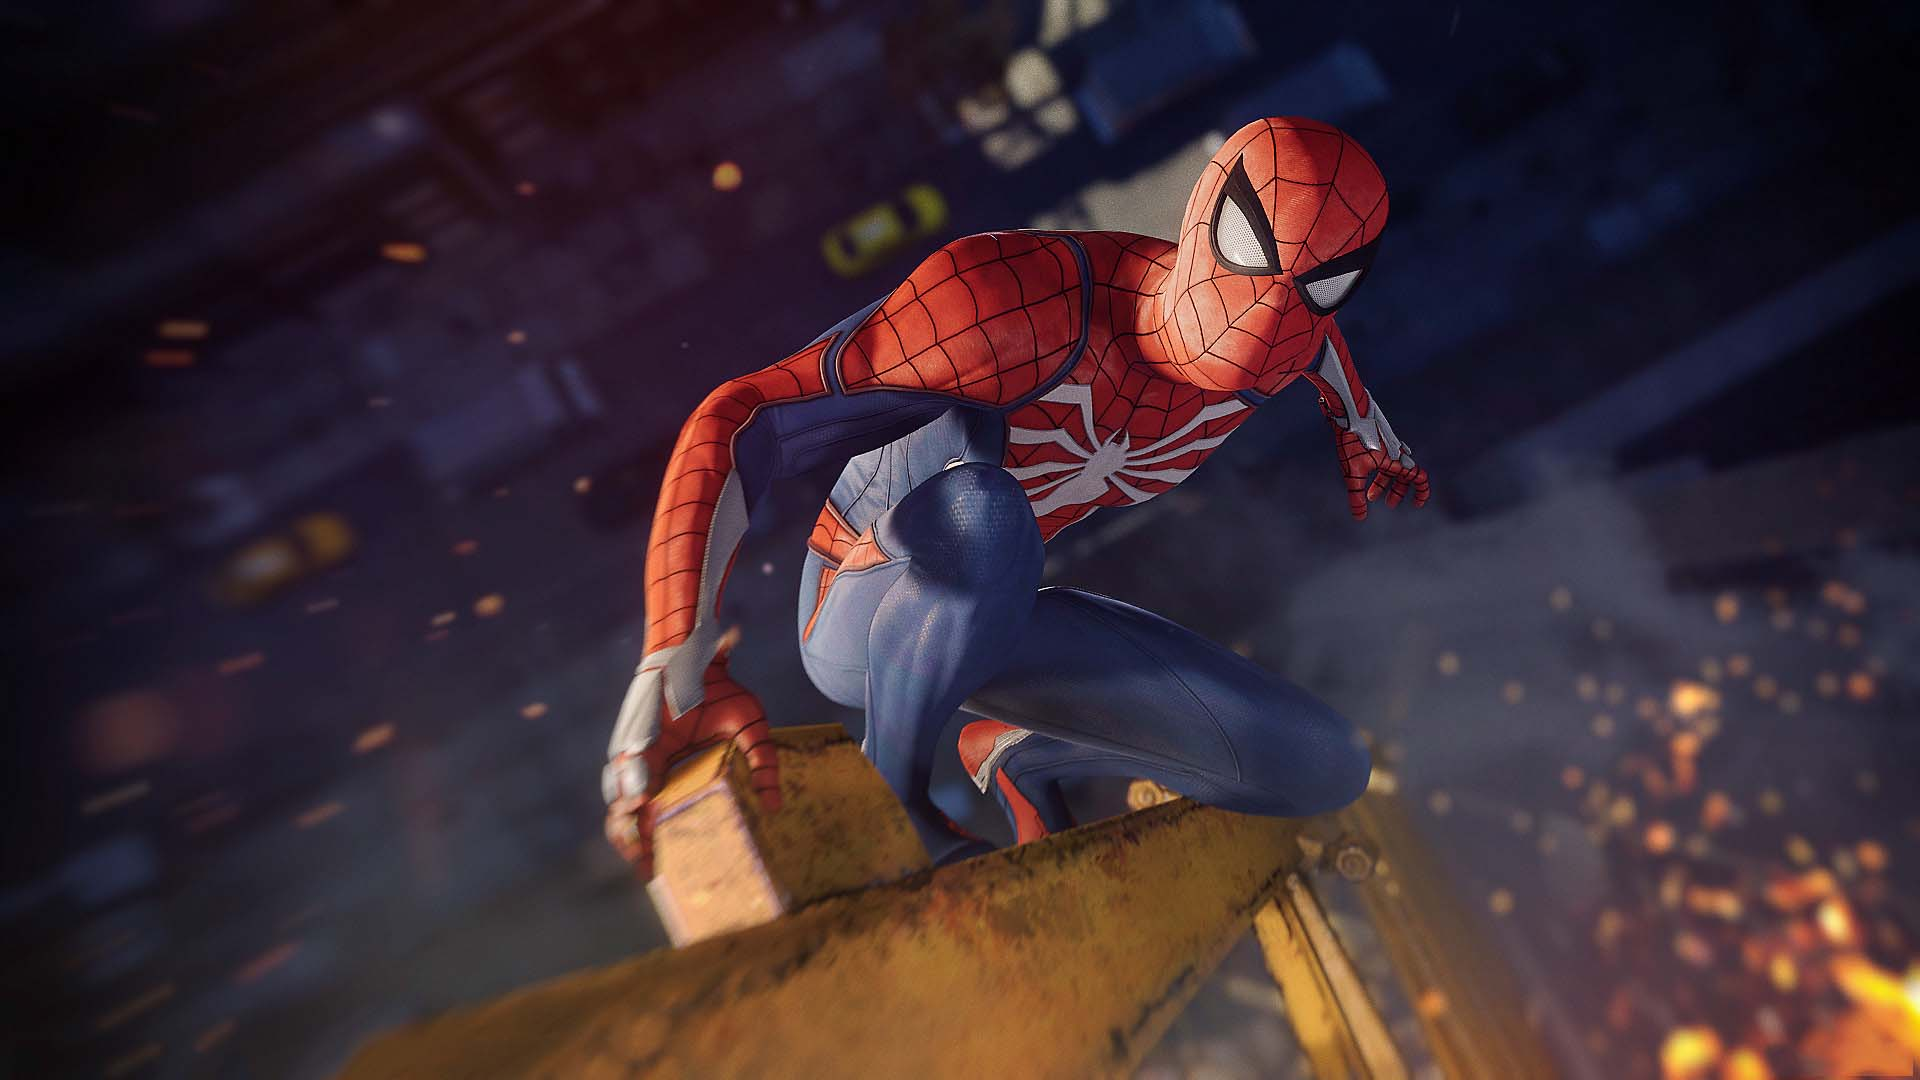 Spider man game wallpaper